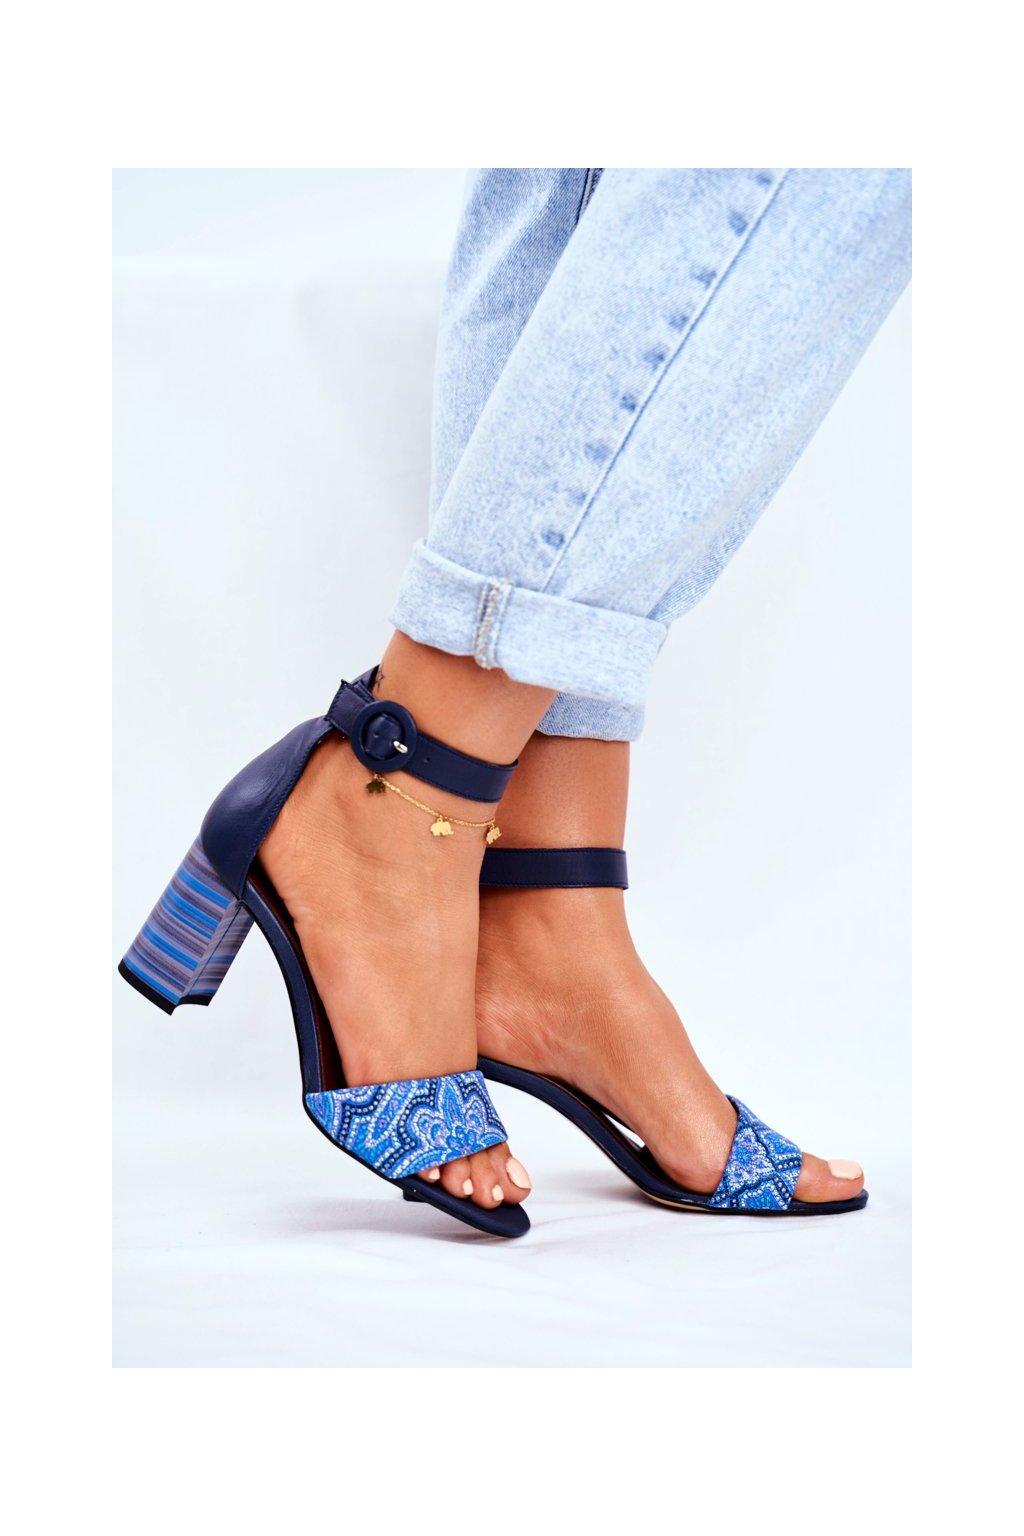 Dámske sandále na podpätku farba modrá kód obuvi 04235-17/00-5 NAVY